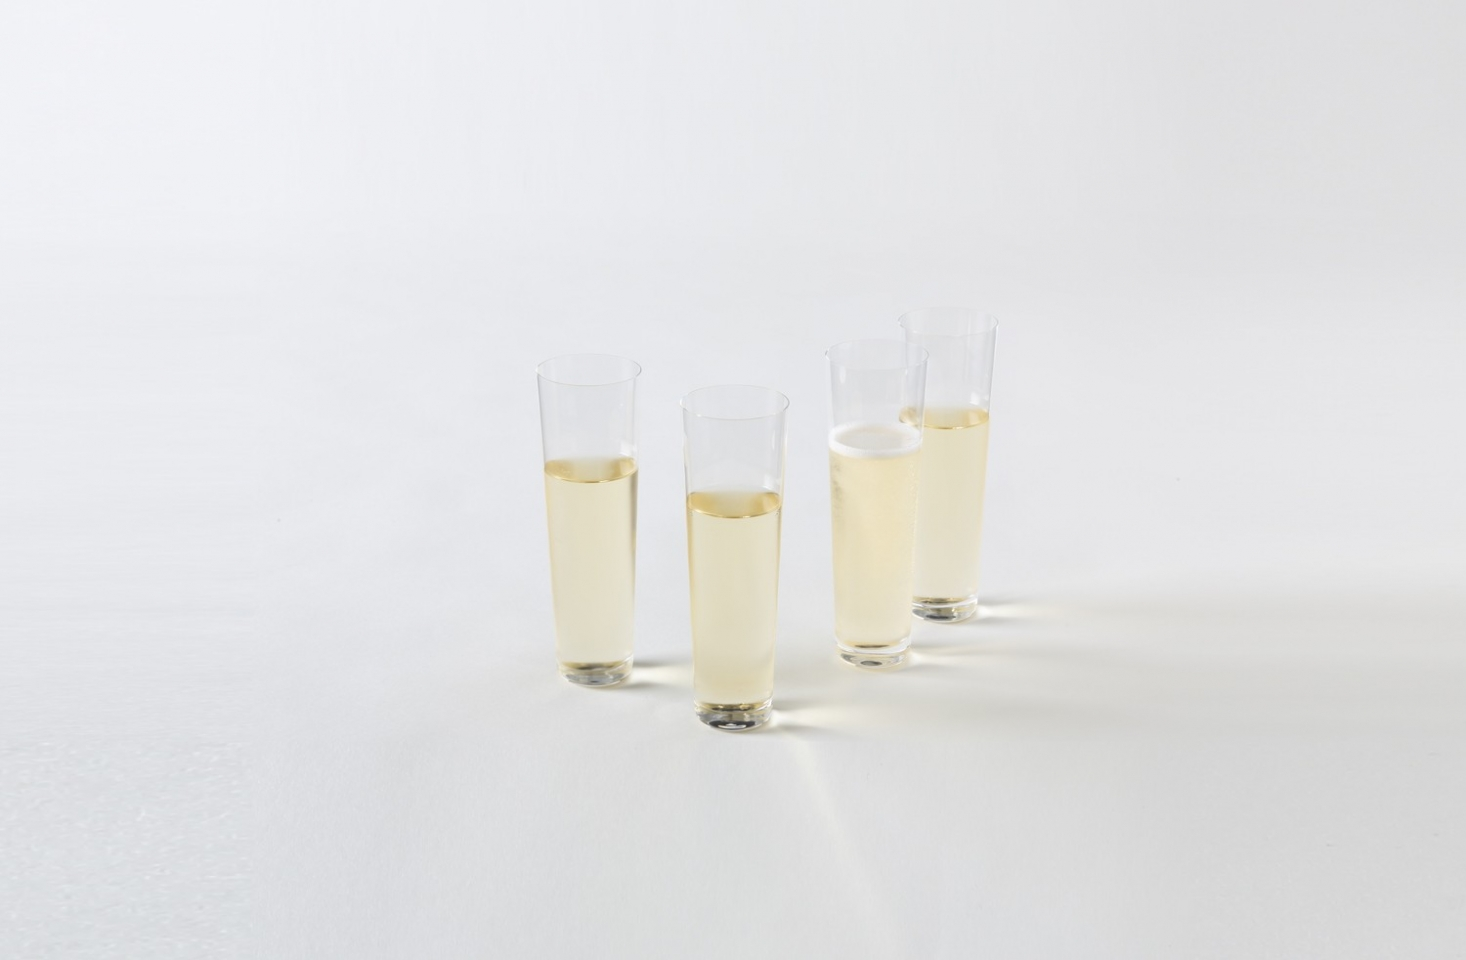 deborah-ehrlich-simple-crystal-straight-champagne-glasses-march-1466x960.jpg